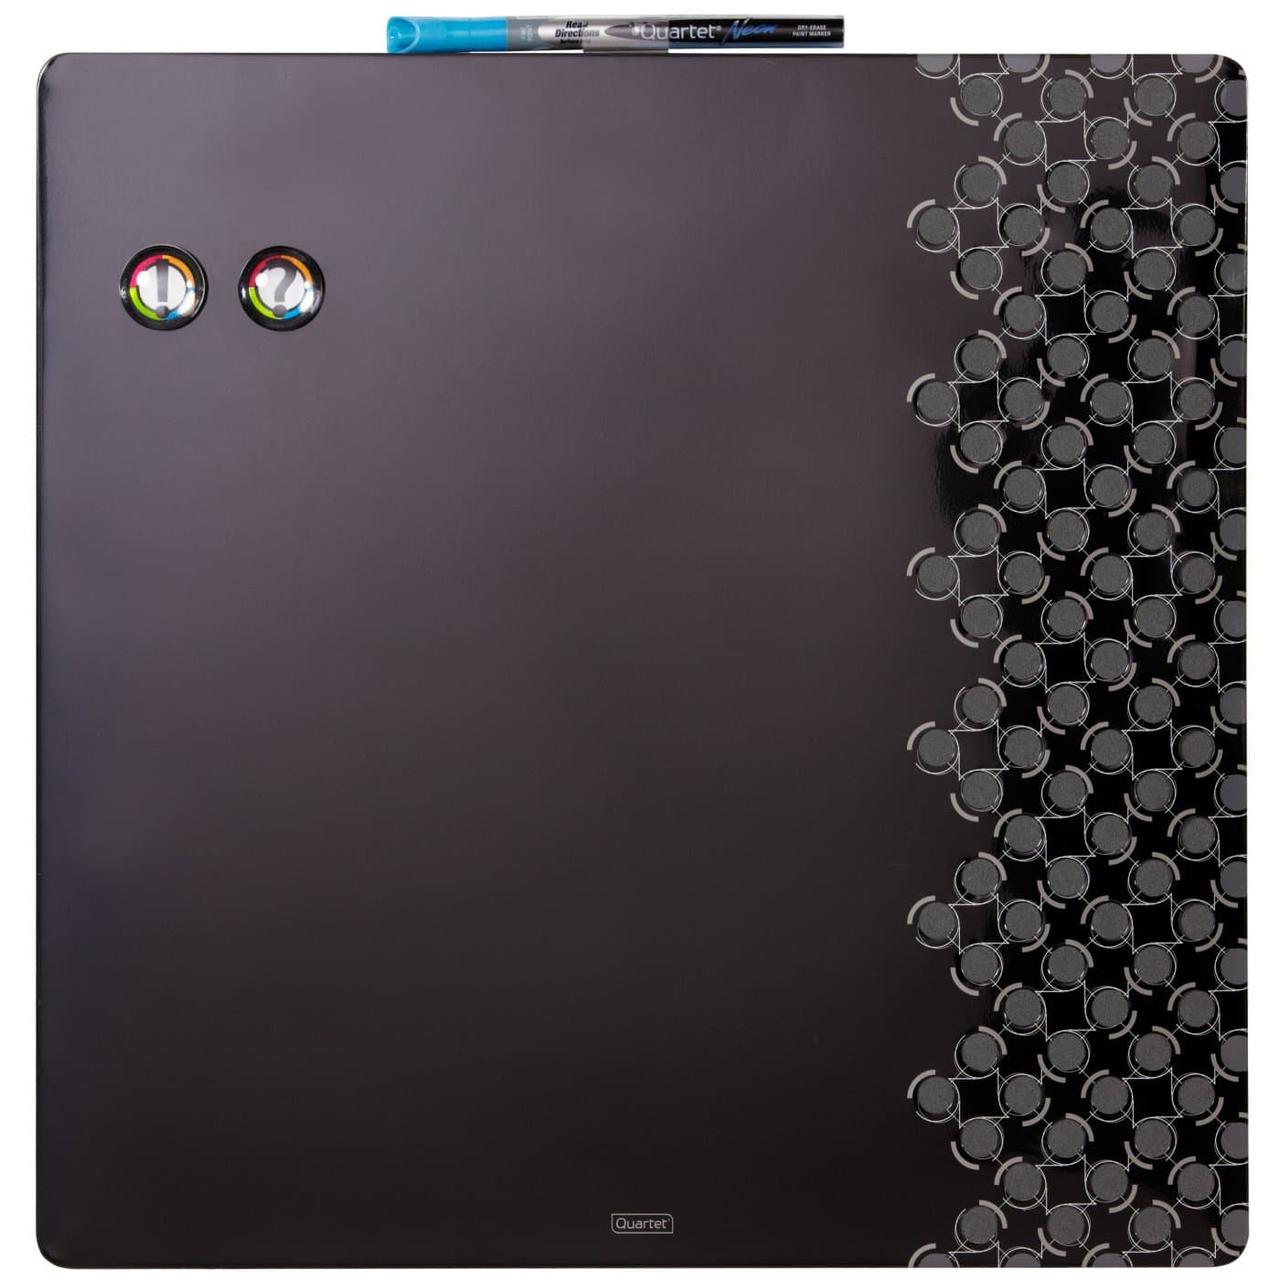 Магнитно-маркерная доска Rexel Quartet 355х355мм,  черная без рамки (1903893)